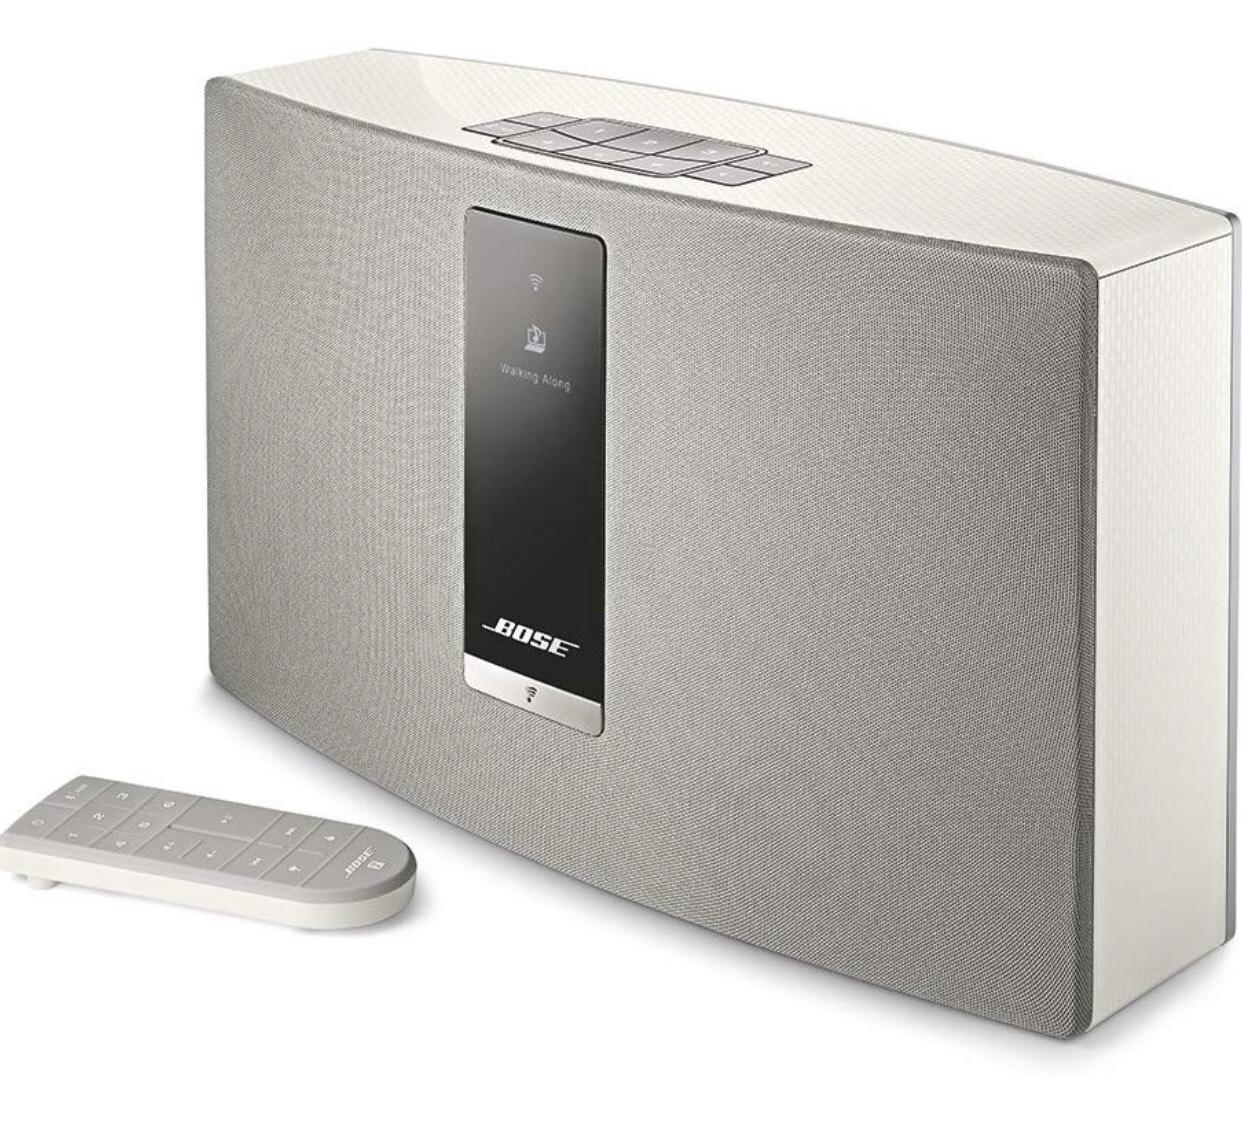 Bose SoundTouch 20 Series III Wireless (Bluetooth/Wi-Fi) Speaker System - White - works with Alexa £219 @ Amazon